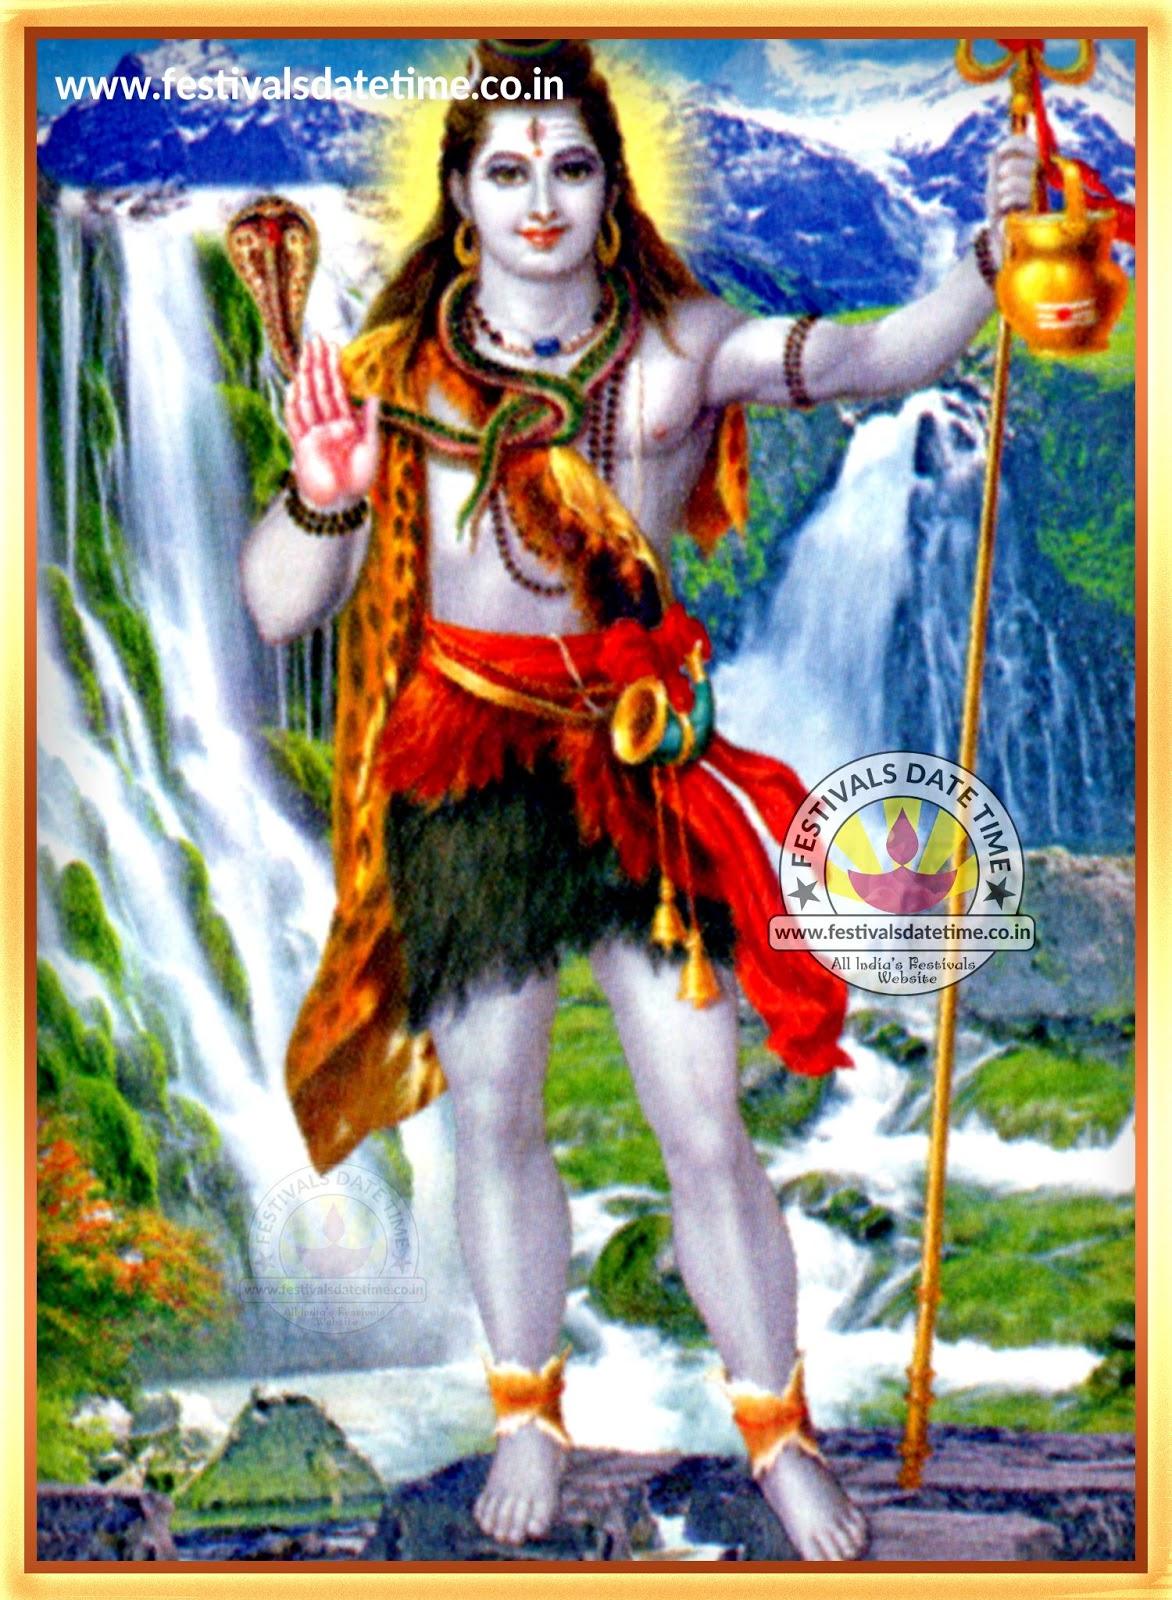 Lord Shiva Wallpaper Free Download À¤à¤—व À¤¨ À¤¶ À¤µ À¤• À¤« À¤Ÿ À¤¡ À¤‰à¤¨à¤² À¤¡ À¤• À¤œ À¤¯ Festivals Date Time